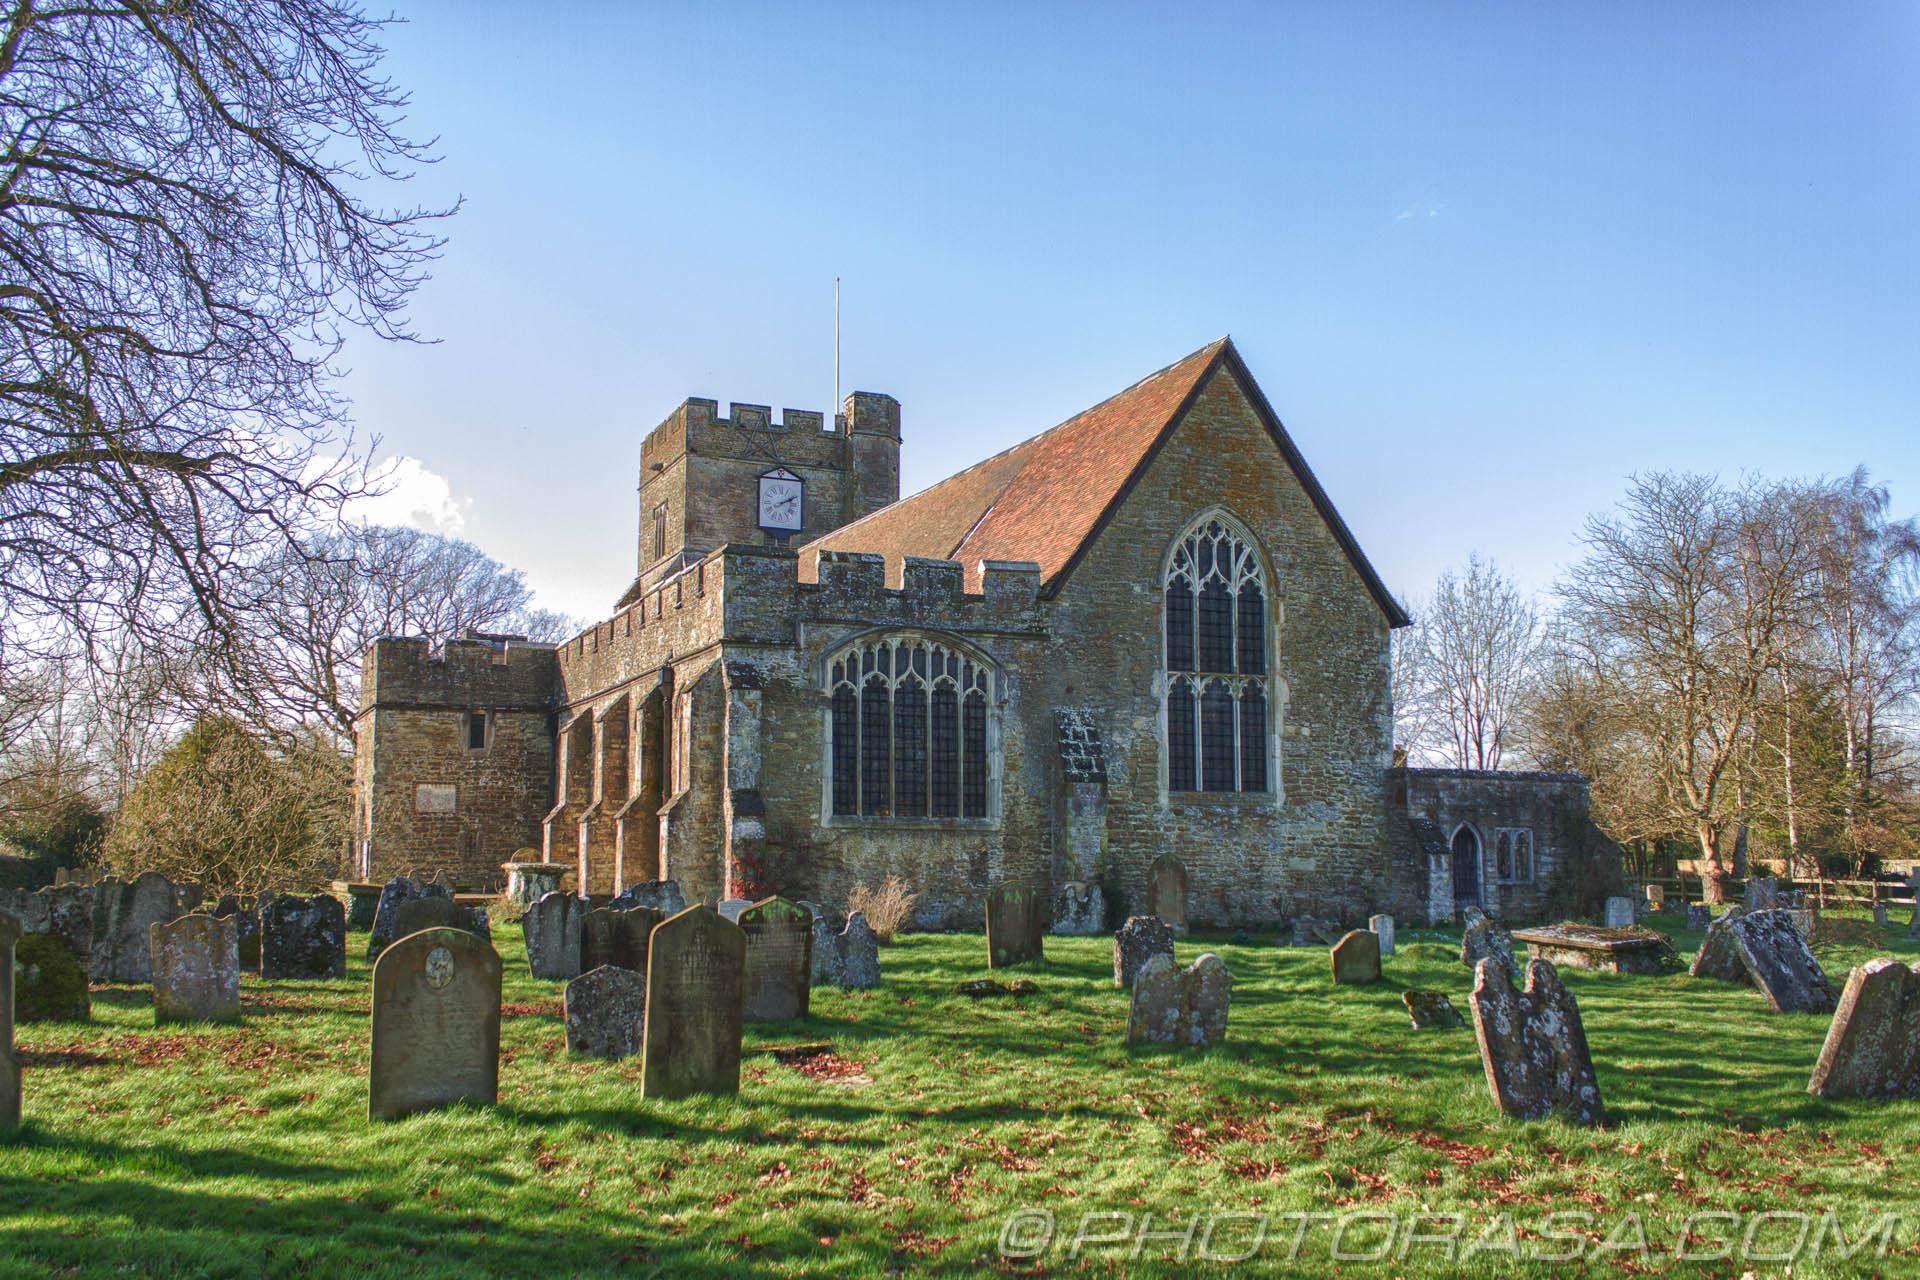 http://photorasa.com/parish-church-st-peter-st-paul-headcorn/front-view/